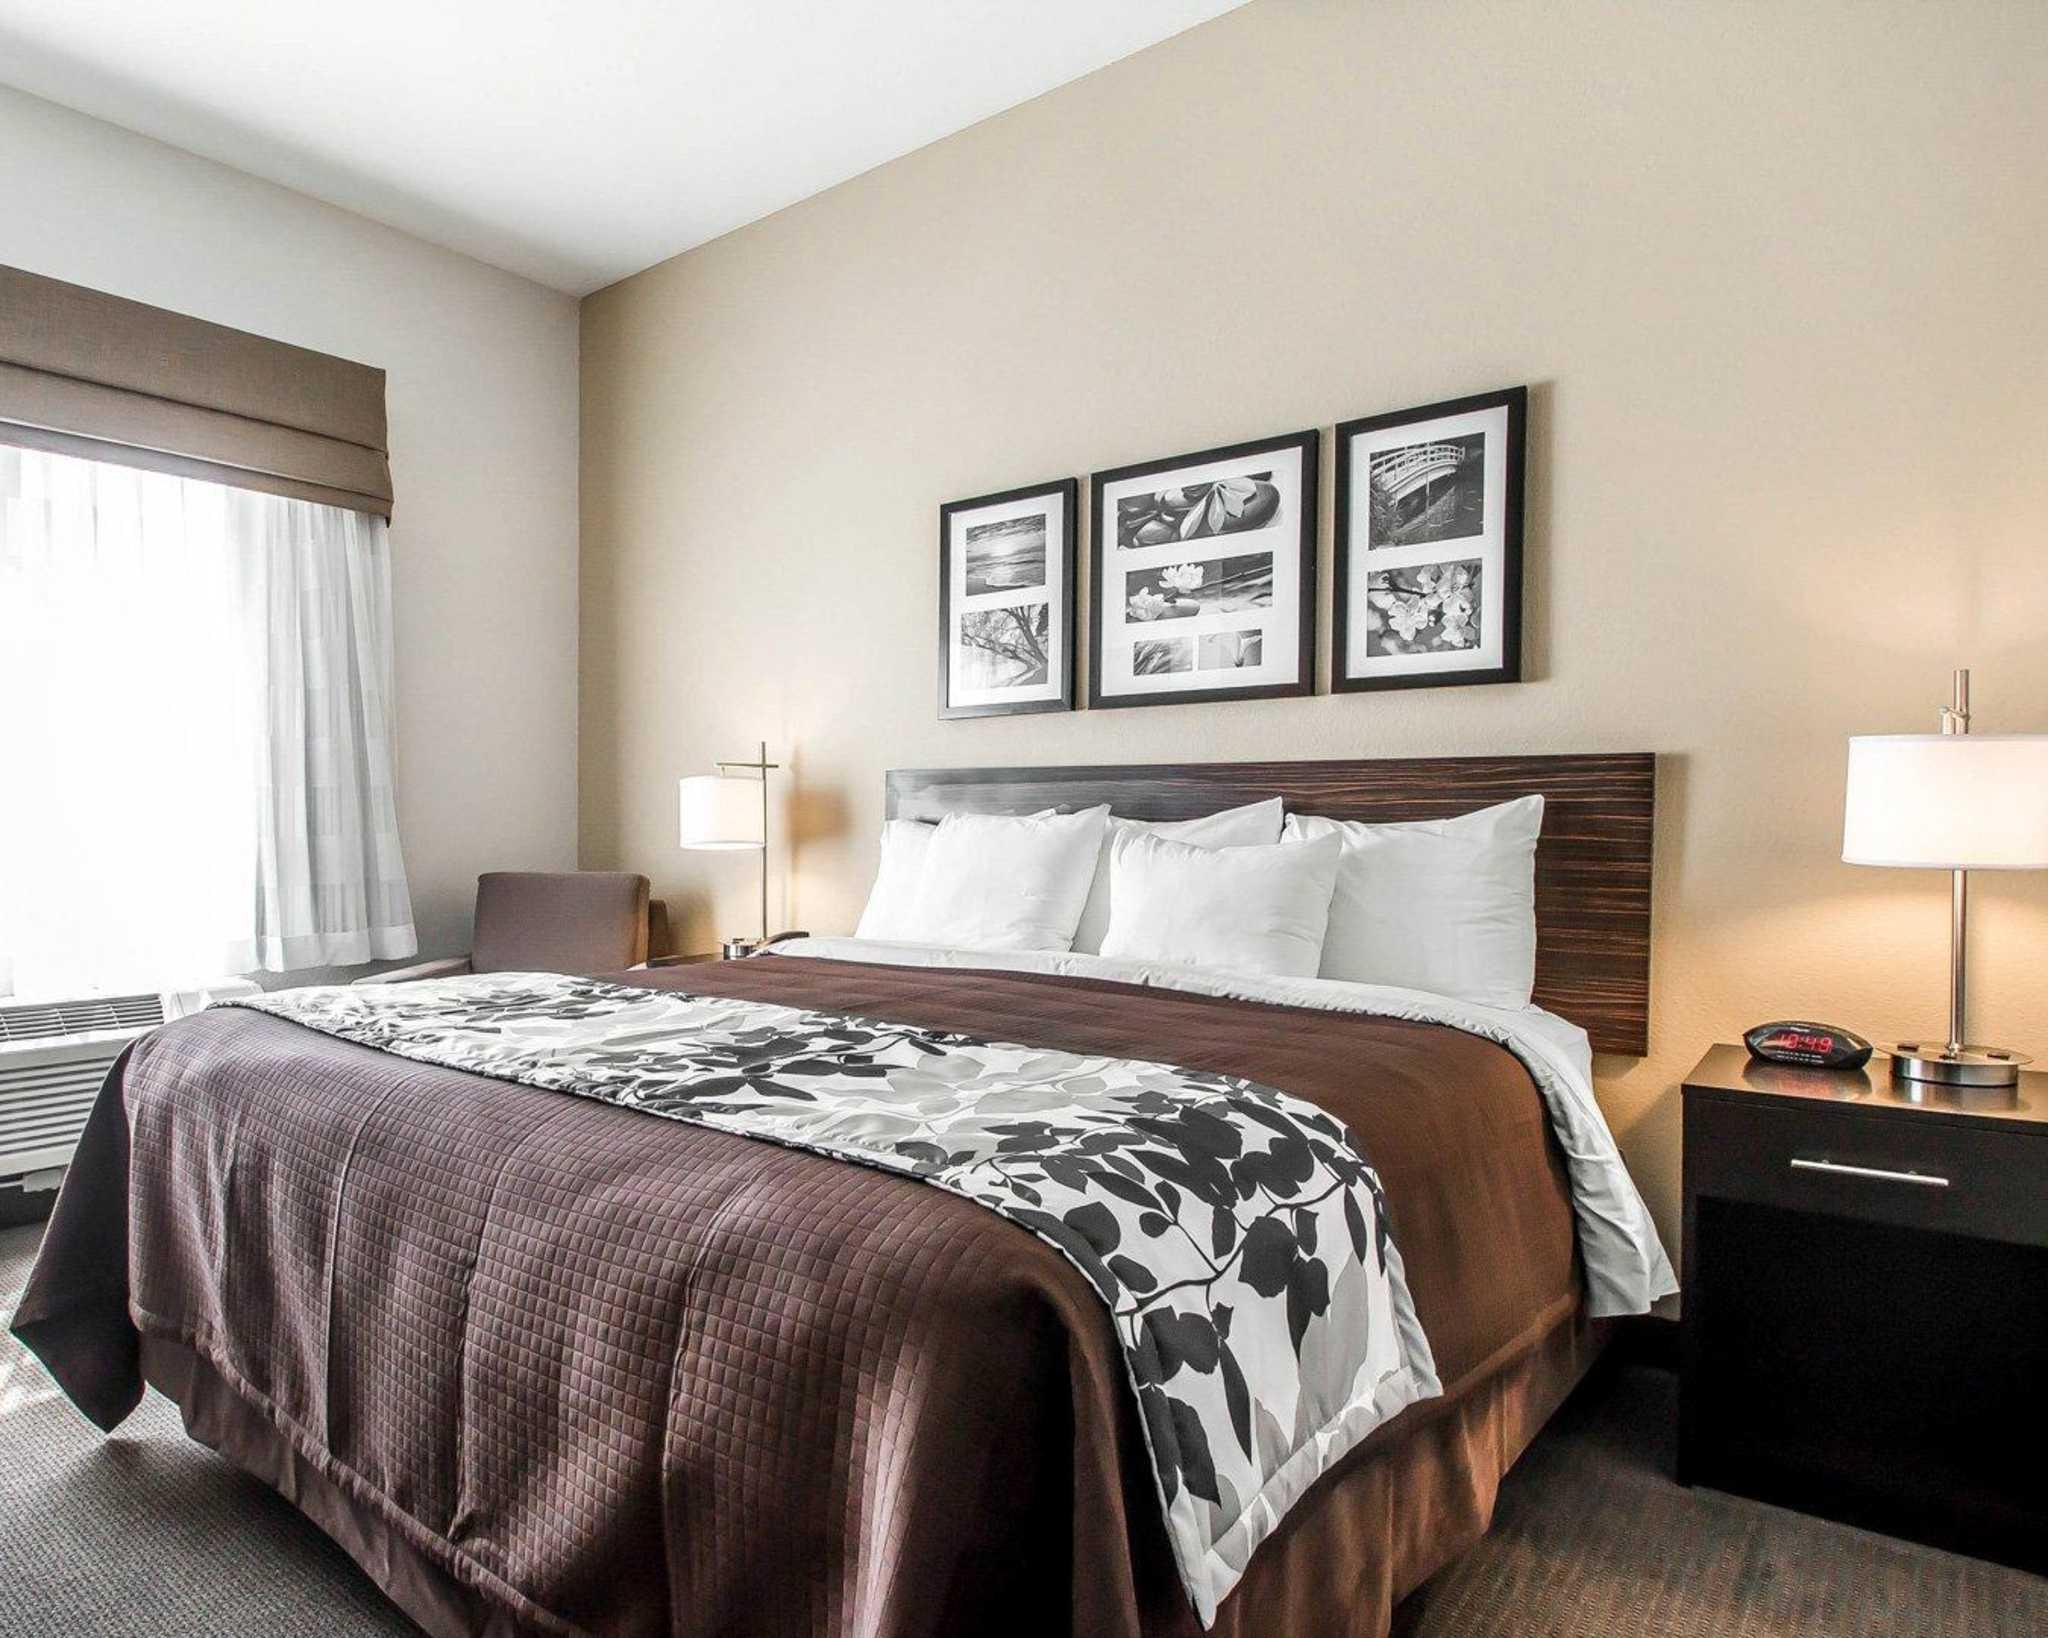 Sleep Inn Hotel Hannibal Mo